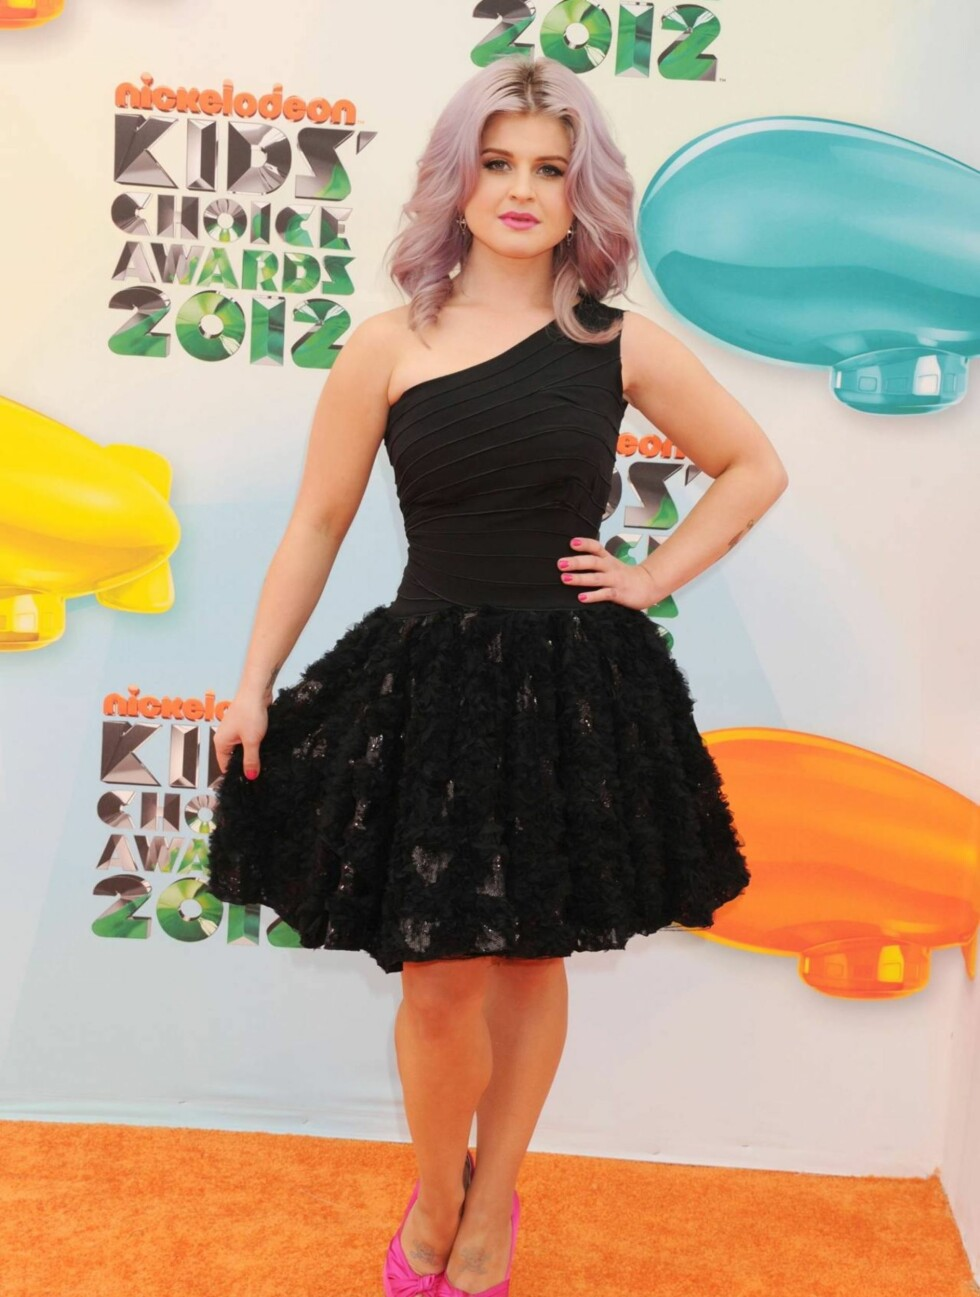 VALGTE SVART: Kelly Osbourne fikk mange beundrende blikk da hun ankom i sin Tony Ward-kjole. Foto: Stella Pictures